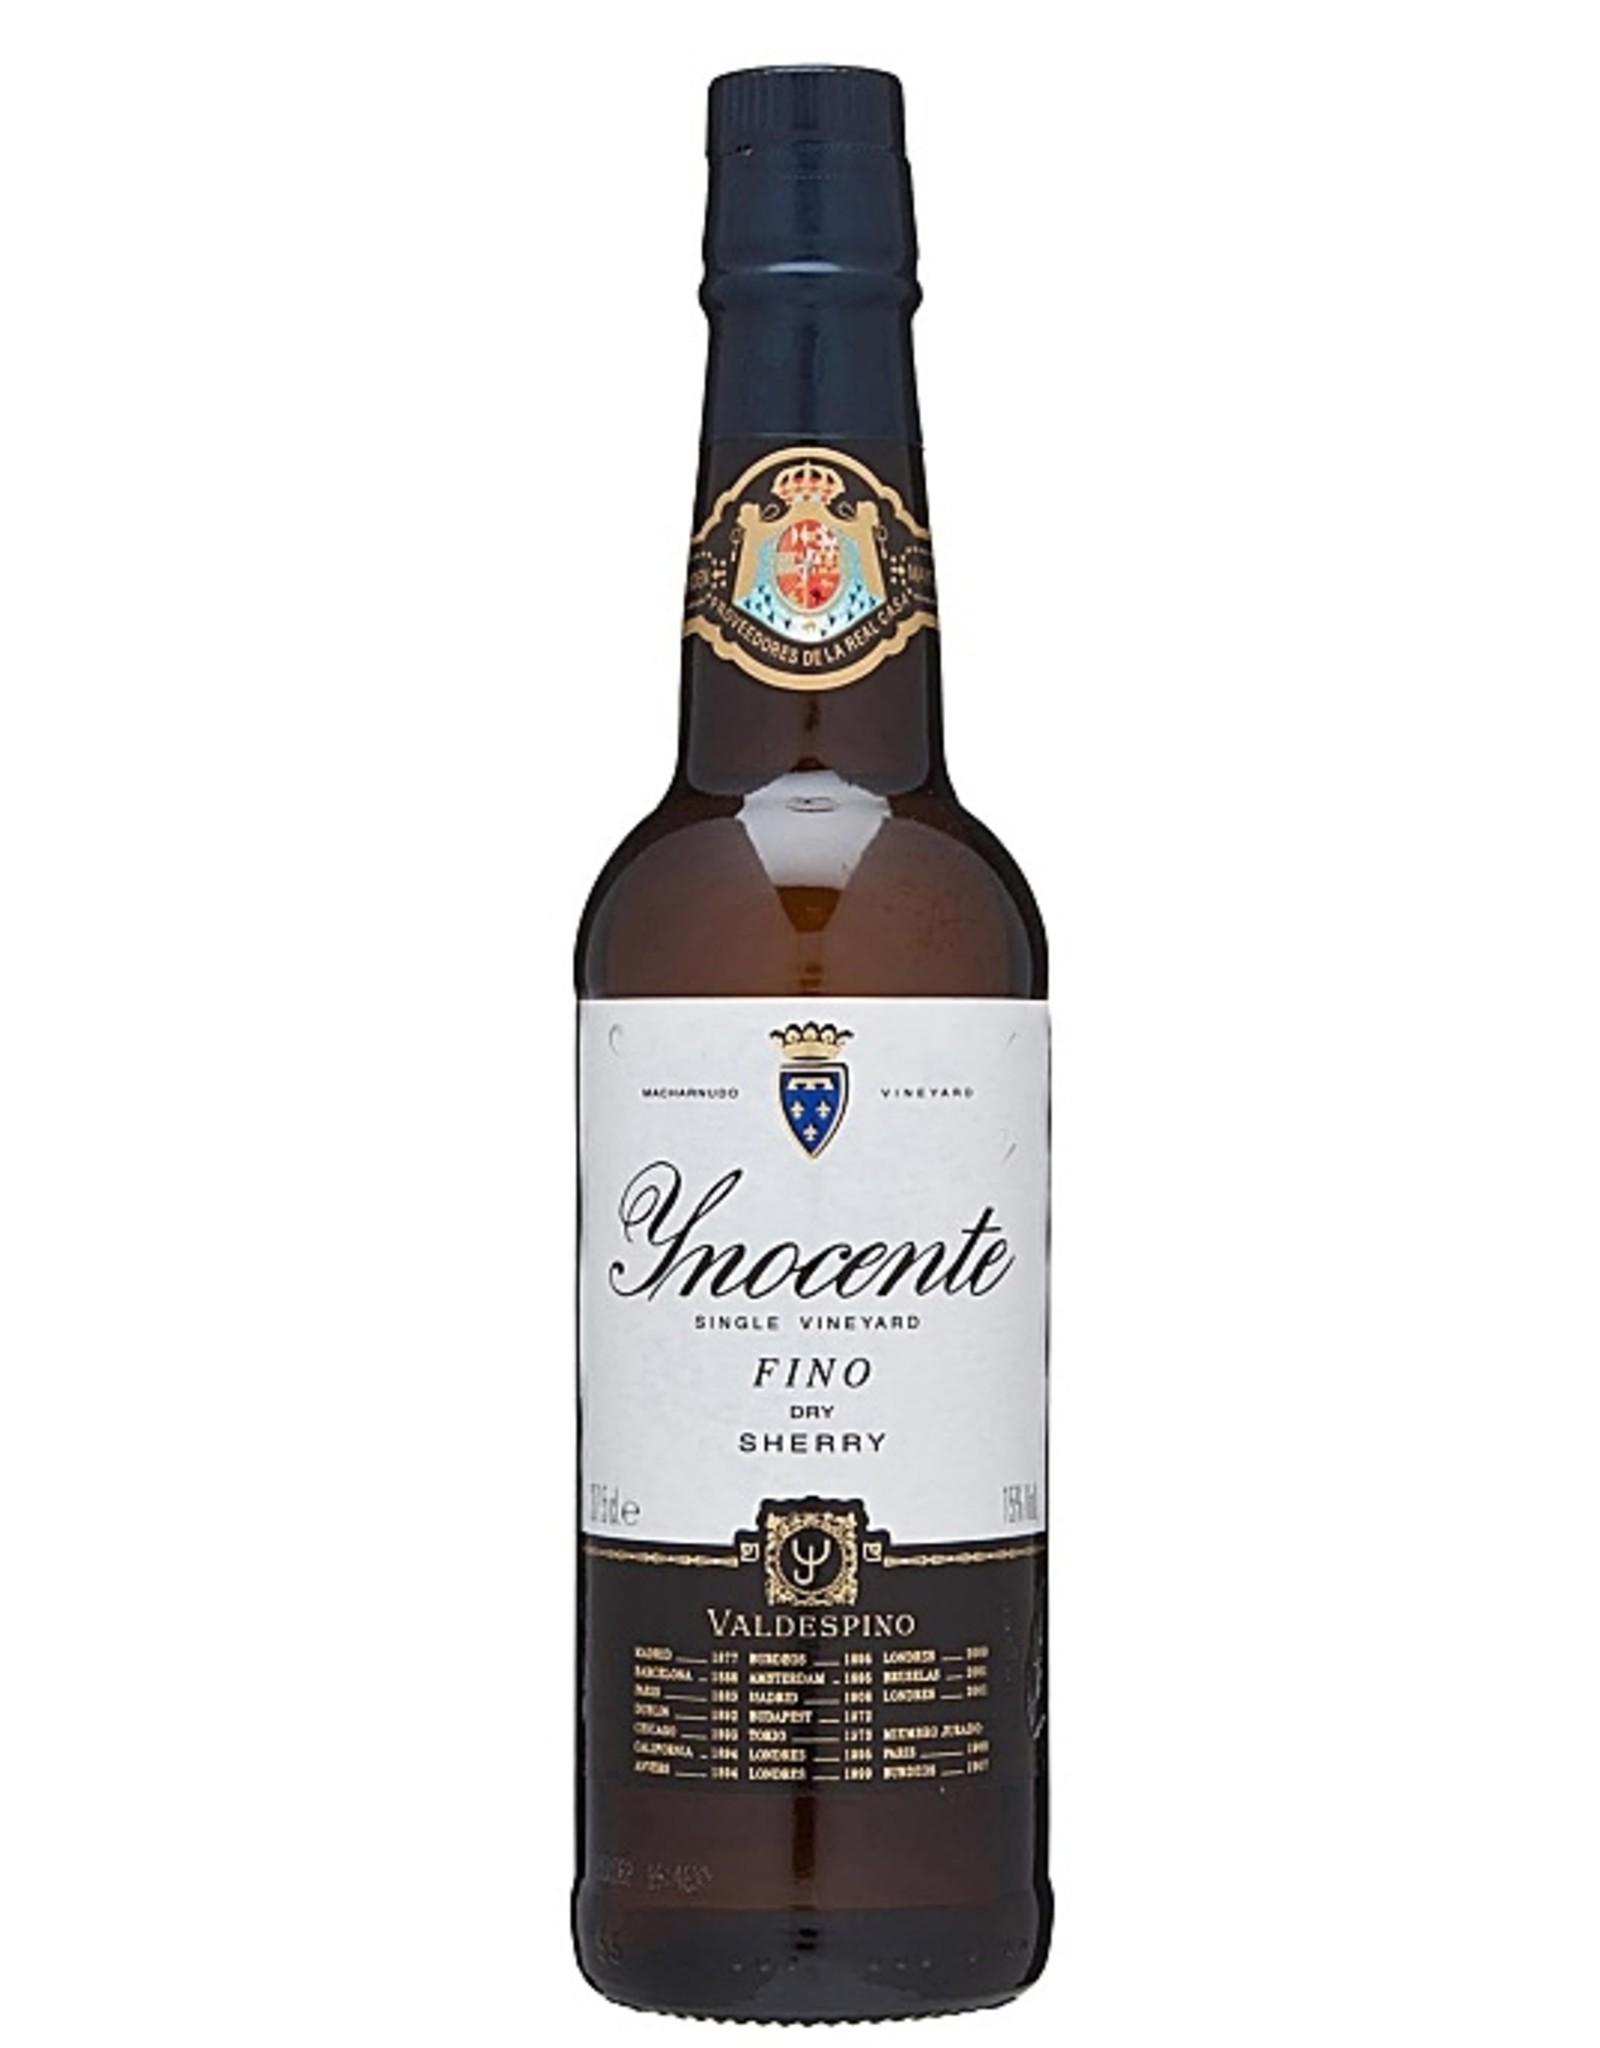 Valdespino Fino Sherry Inocente 375ml